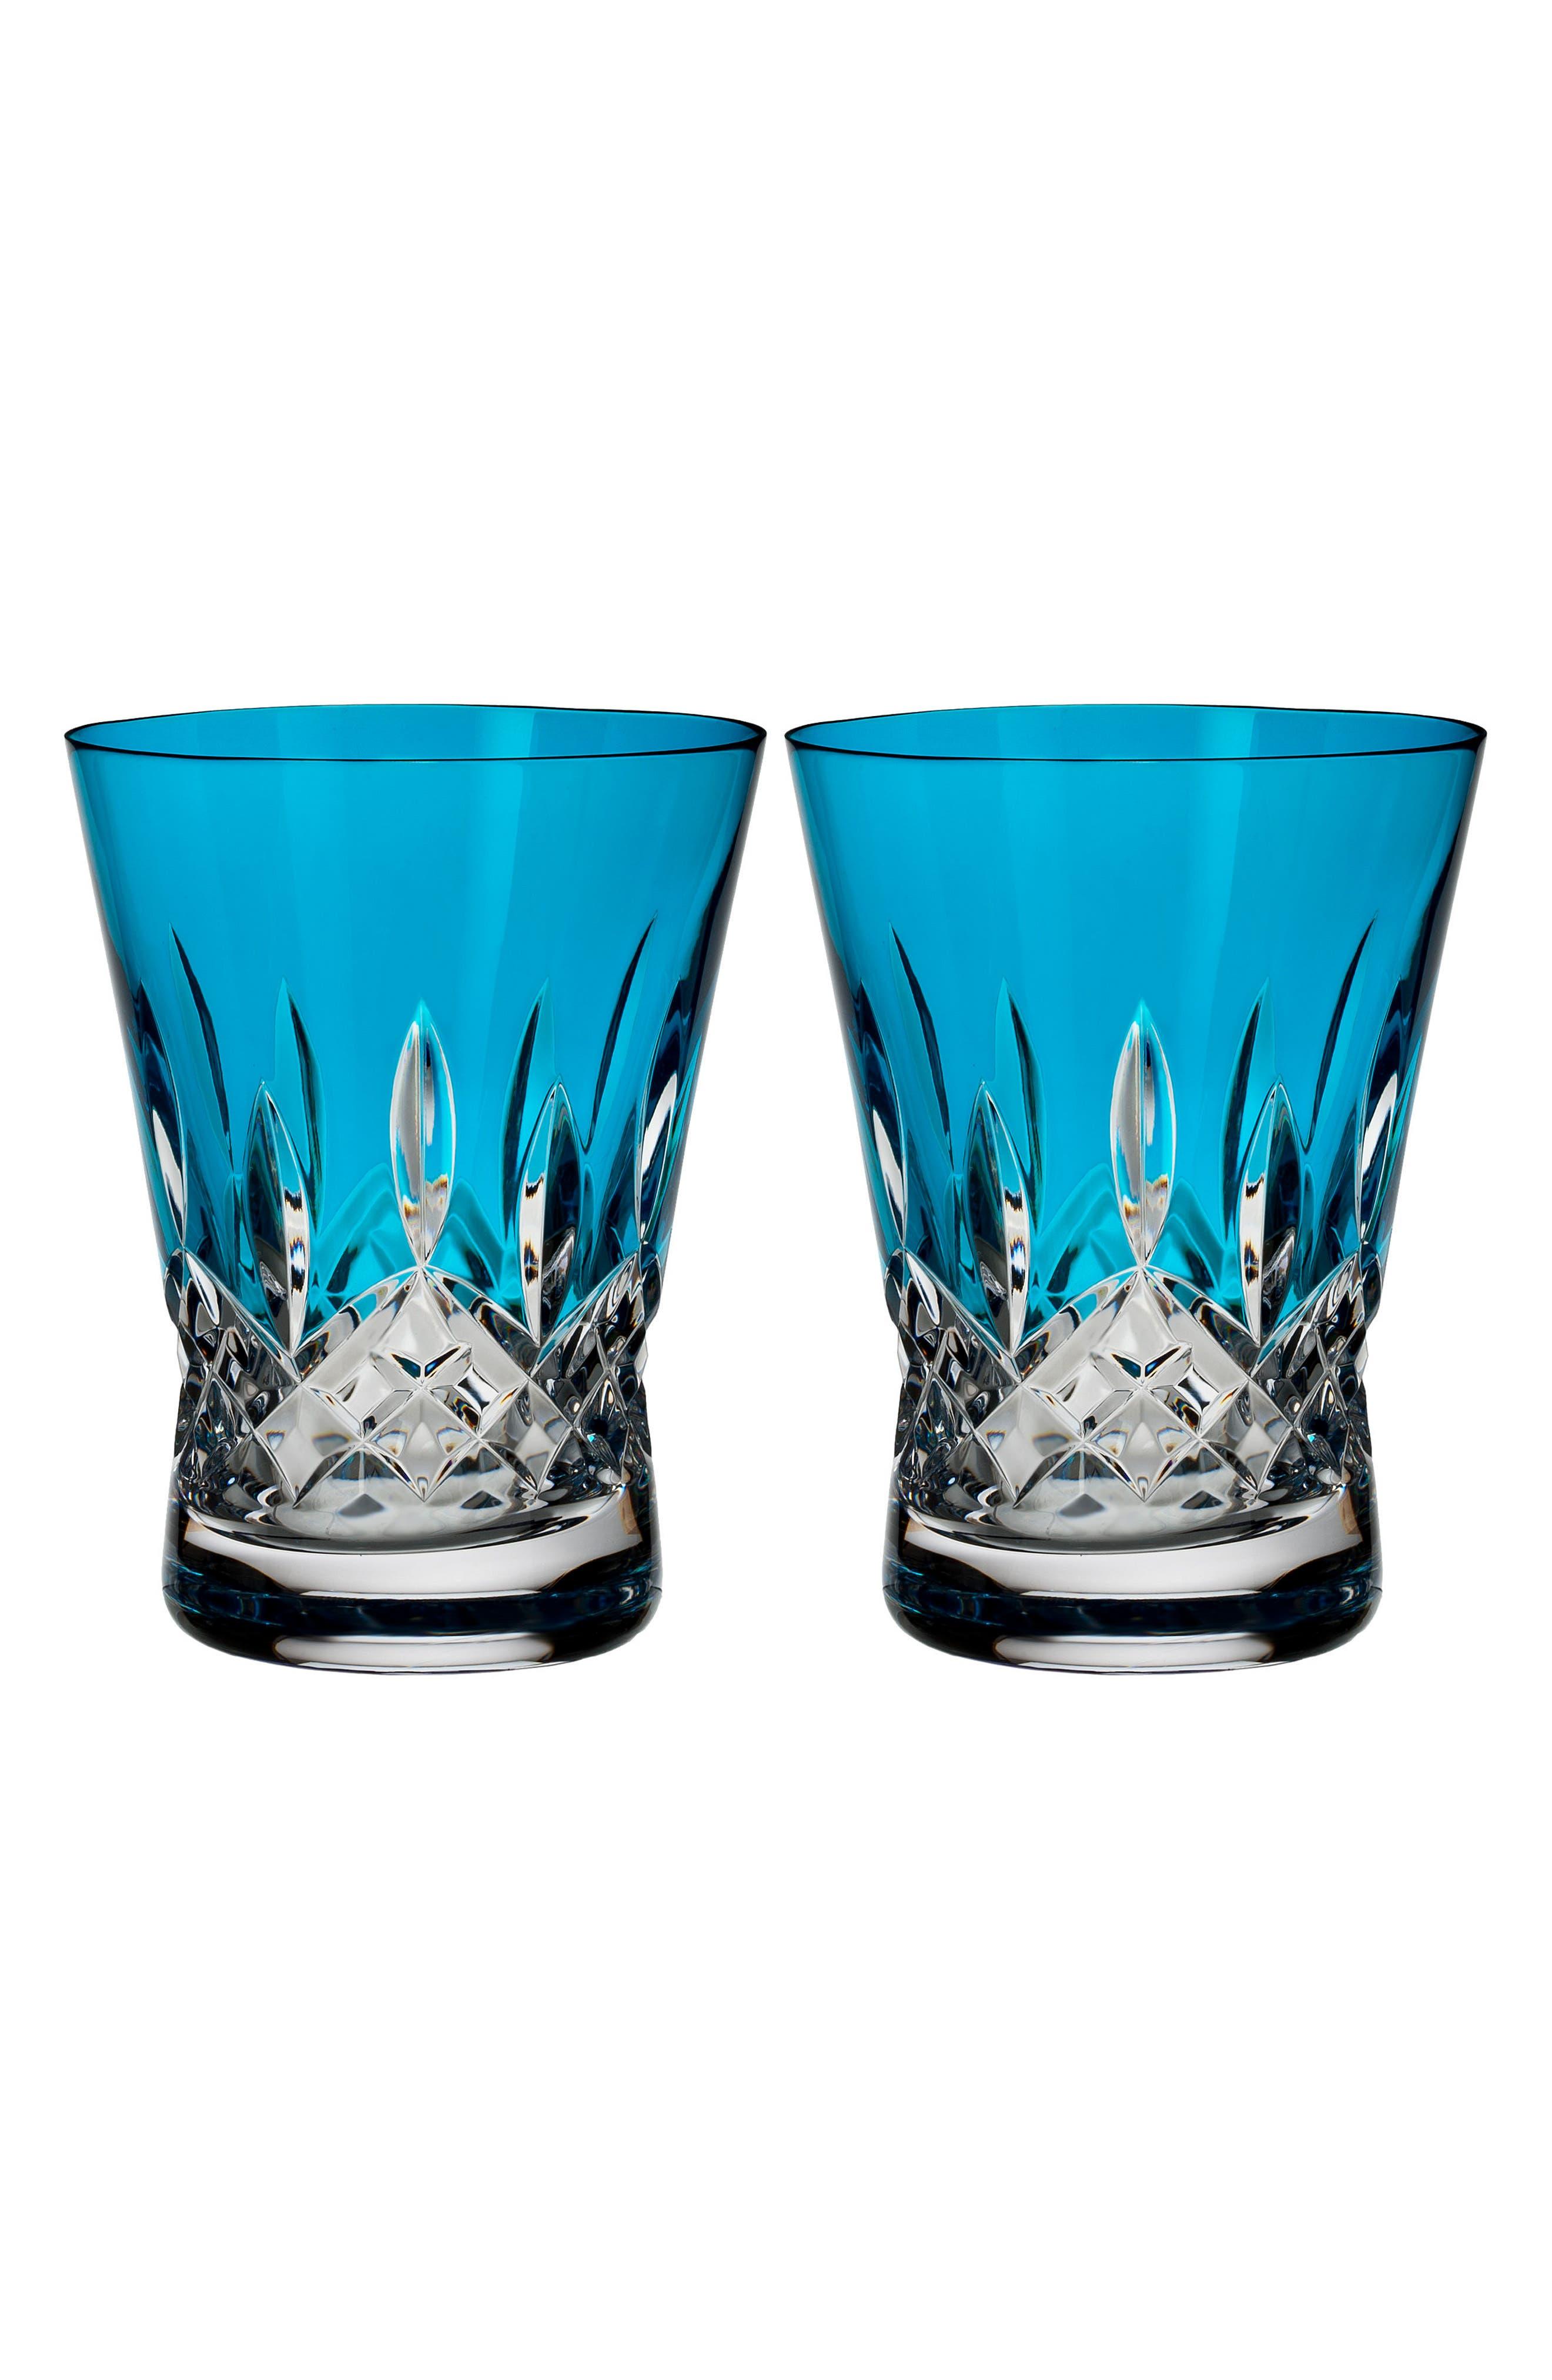 Lismore Pops Set of 2 Aqua Lead Crystal Double Old Fashioned Glasses,                             Main thumbnail 1, color,                             100